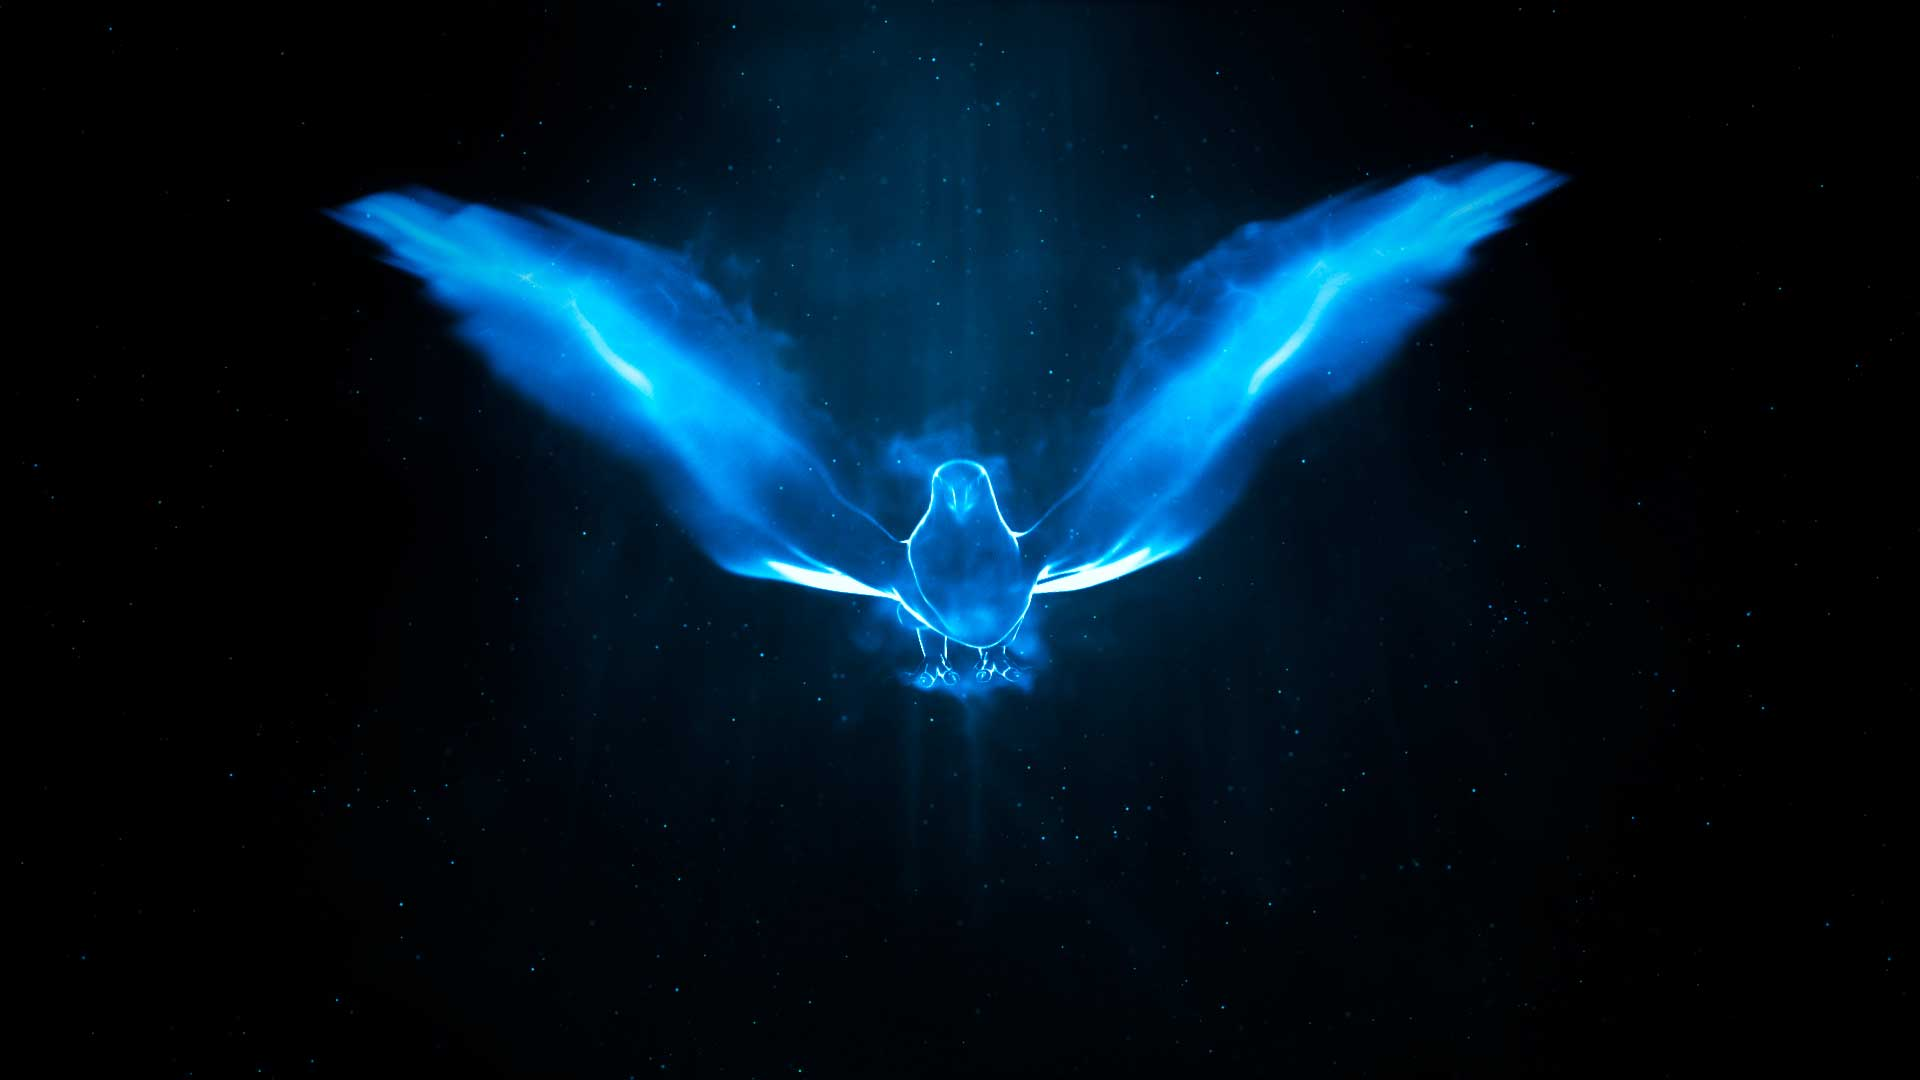 Logo-animado-Ave-mágica-AL316_00